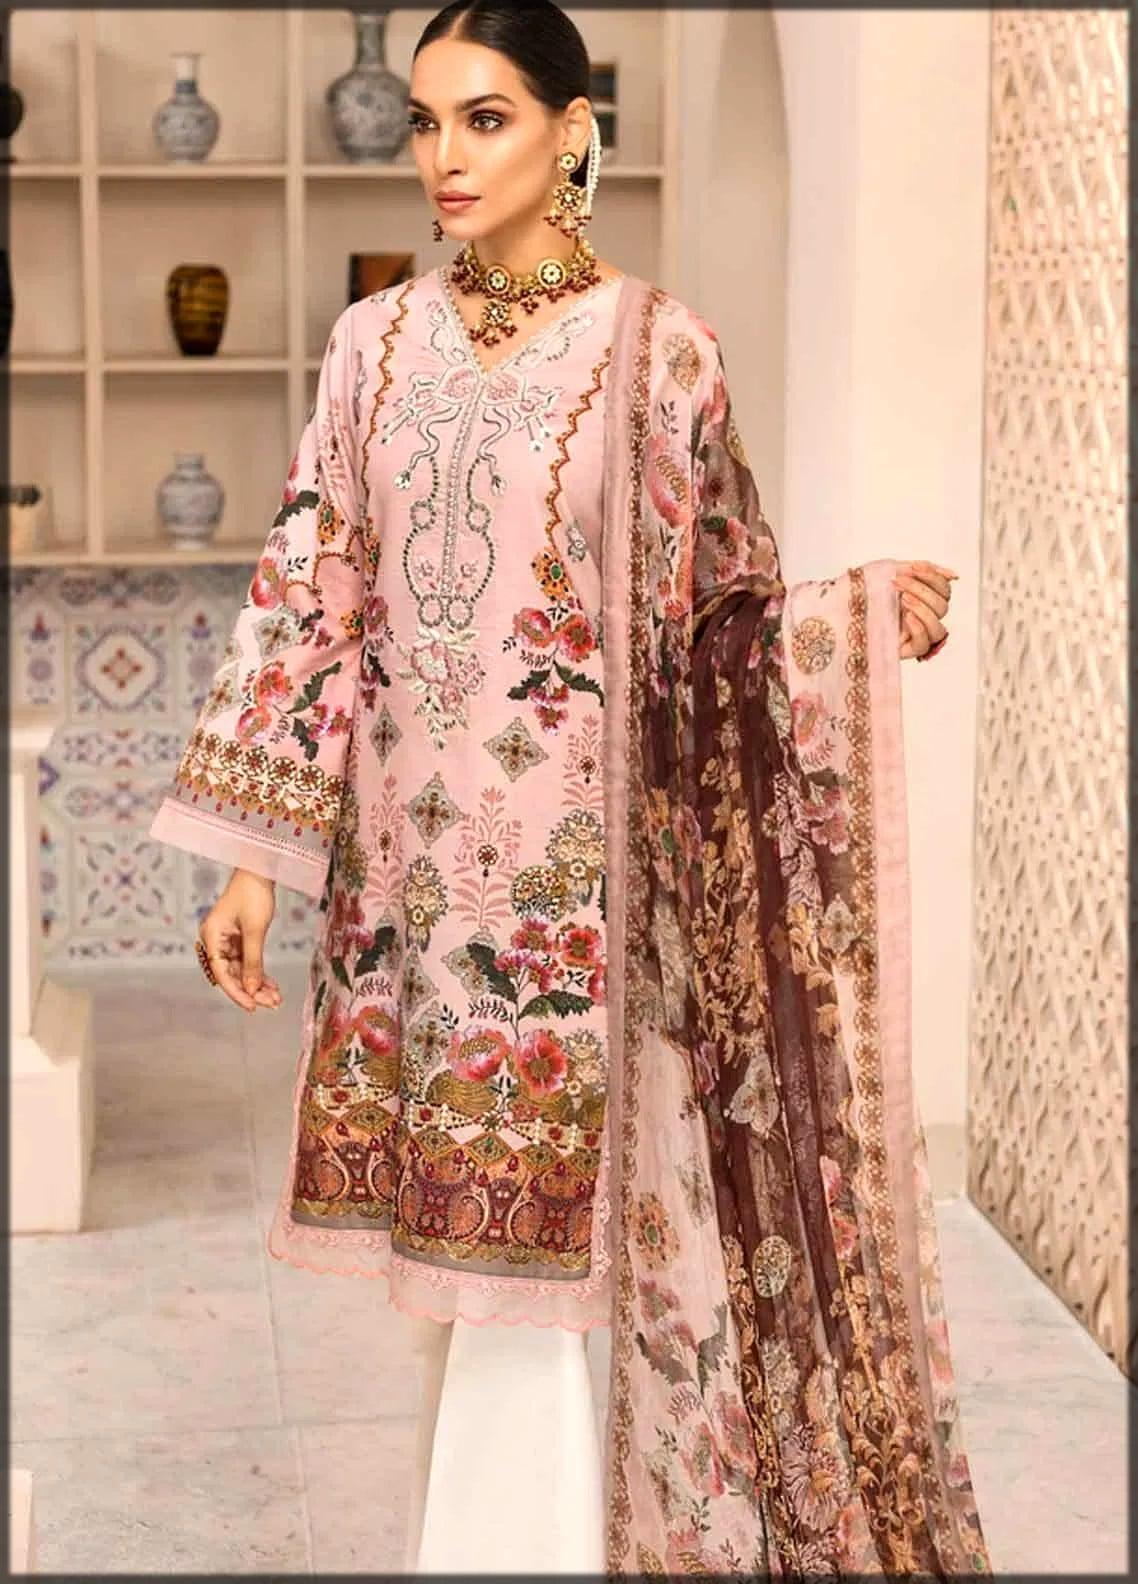 Lawn dress by pakistani designer